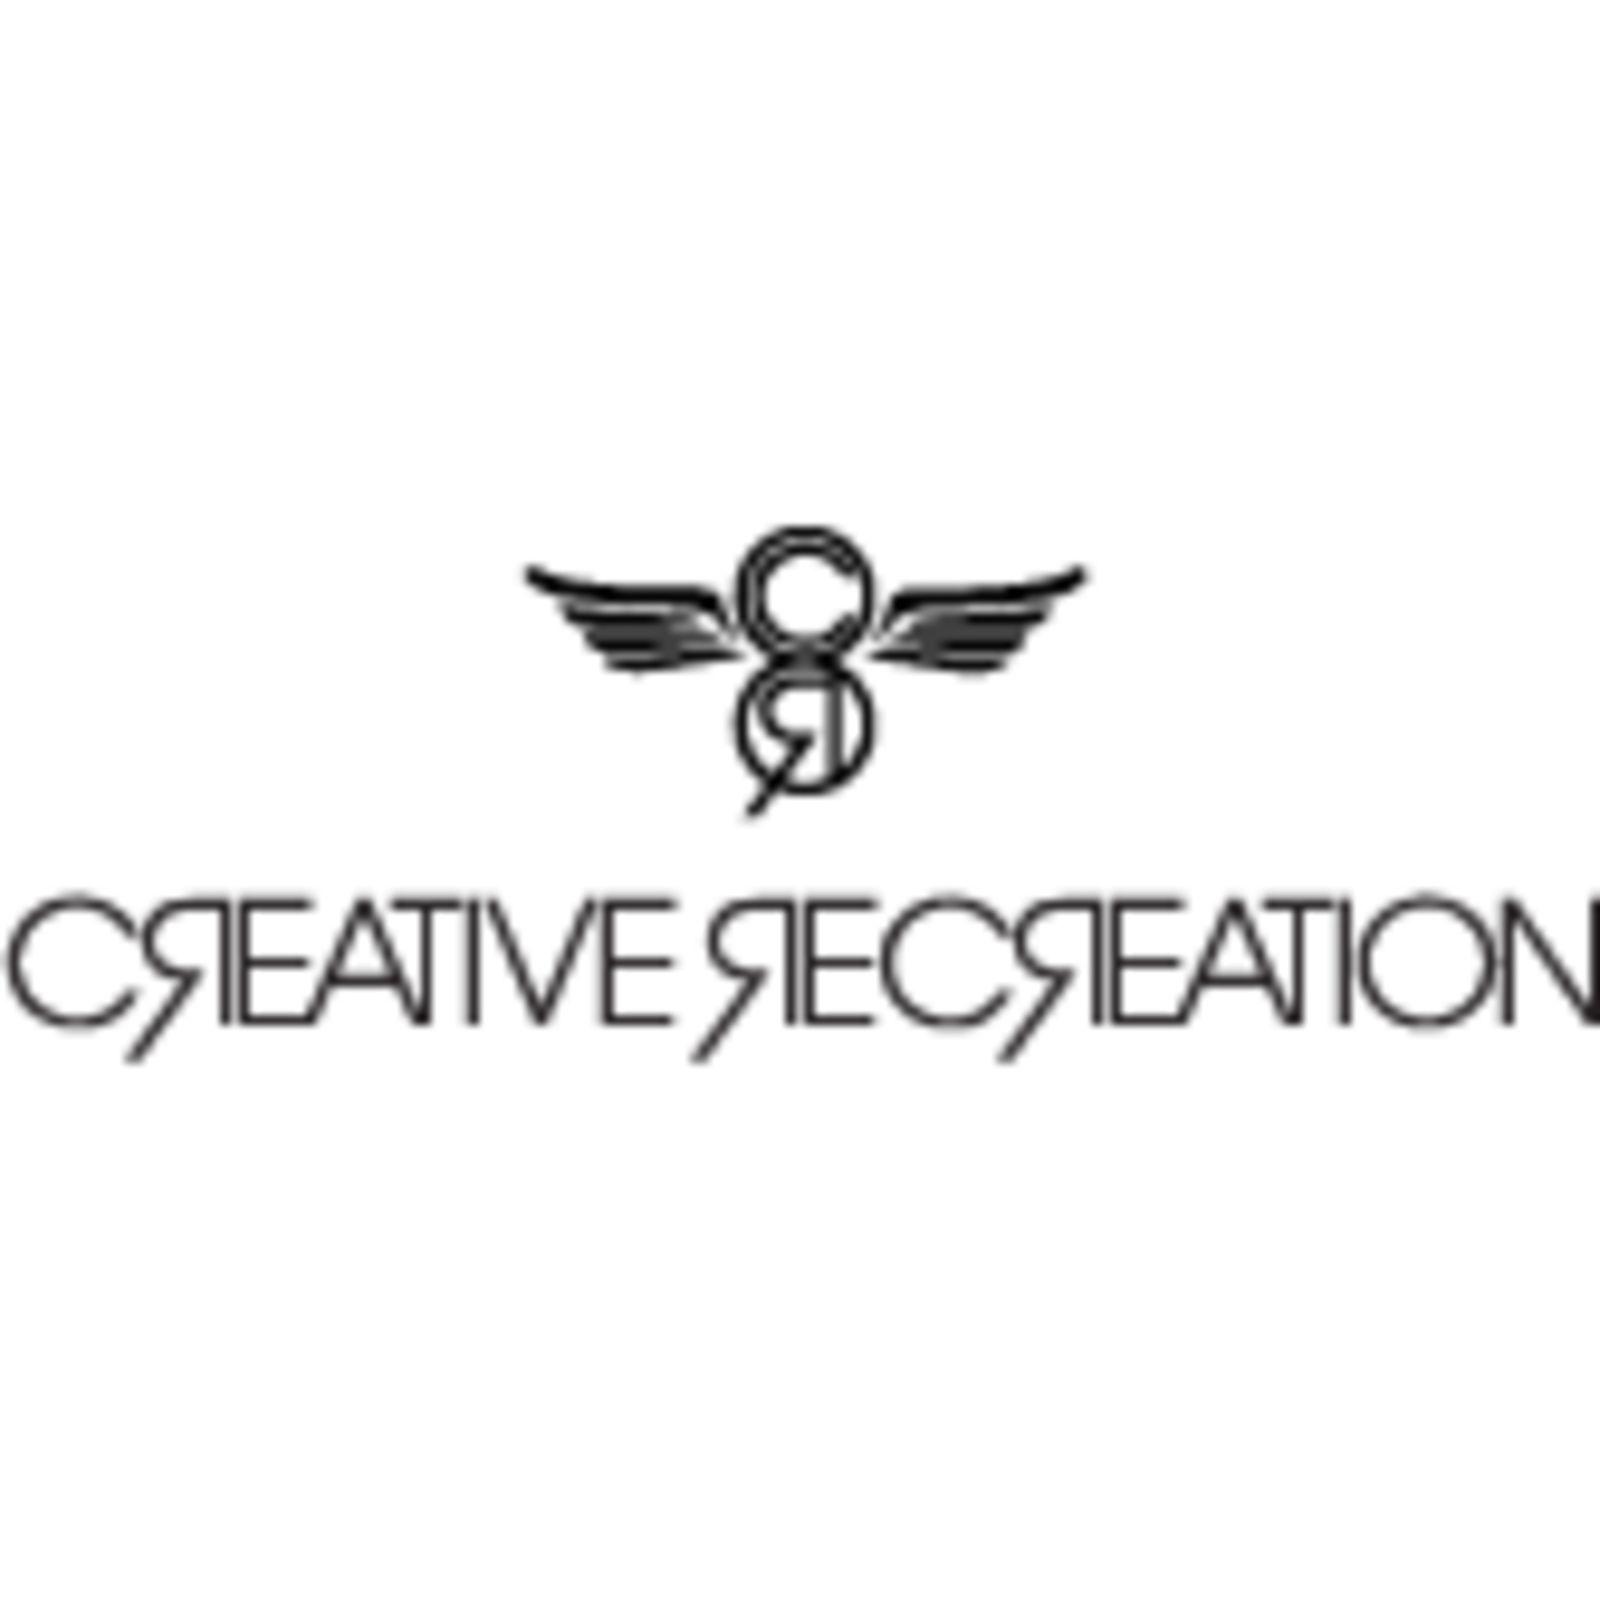 CREATIVE RECREATION (Image 1)